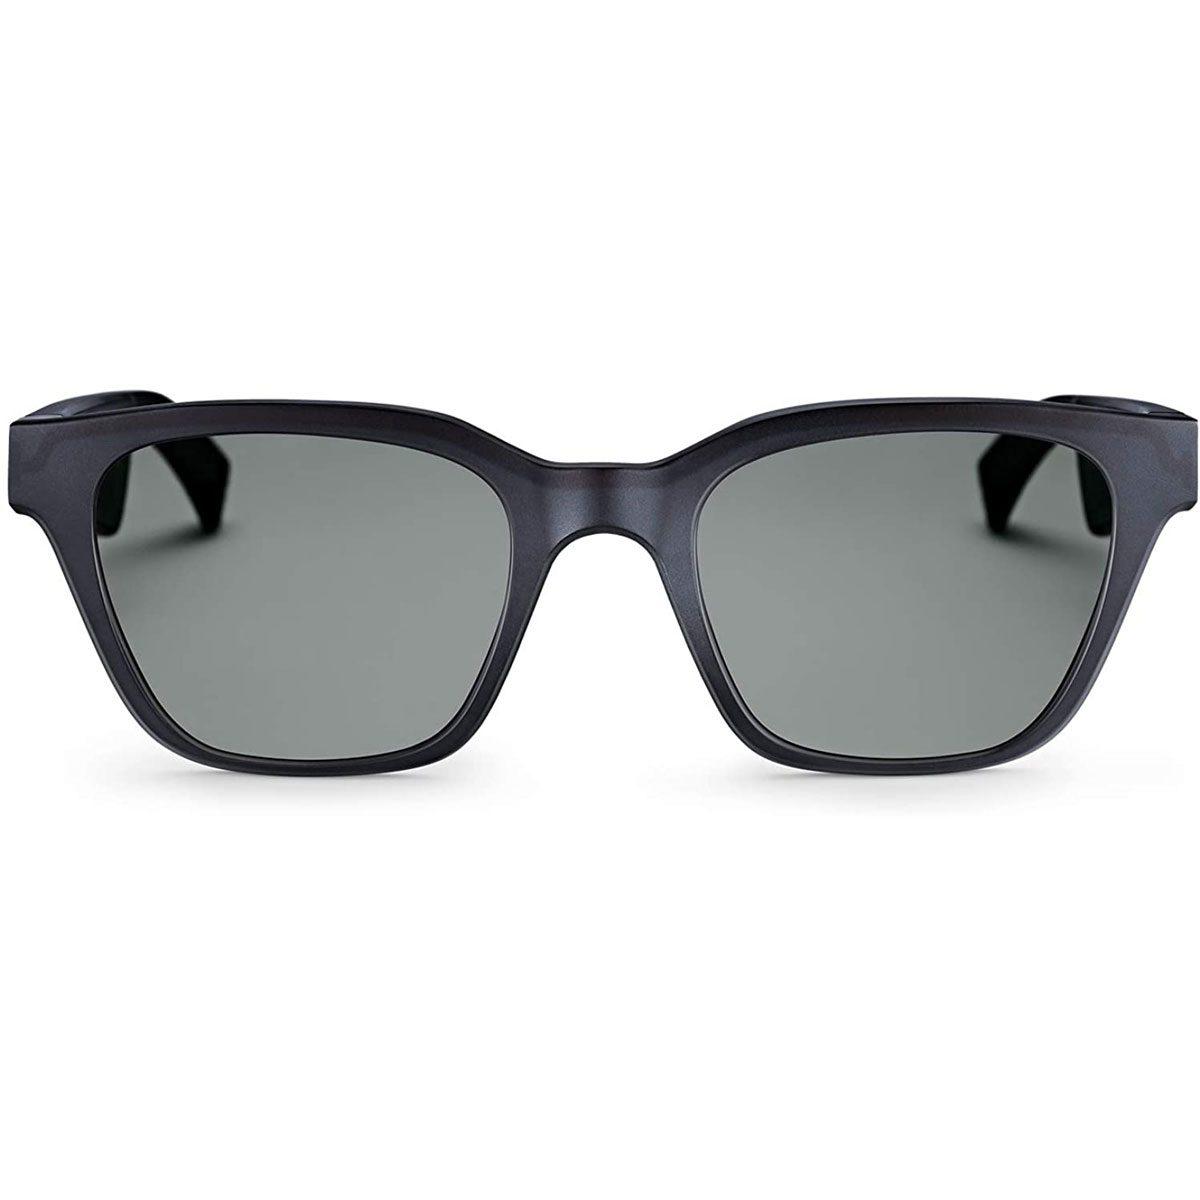 Smart sunglasses